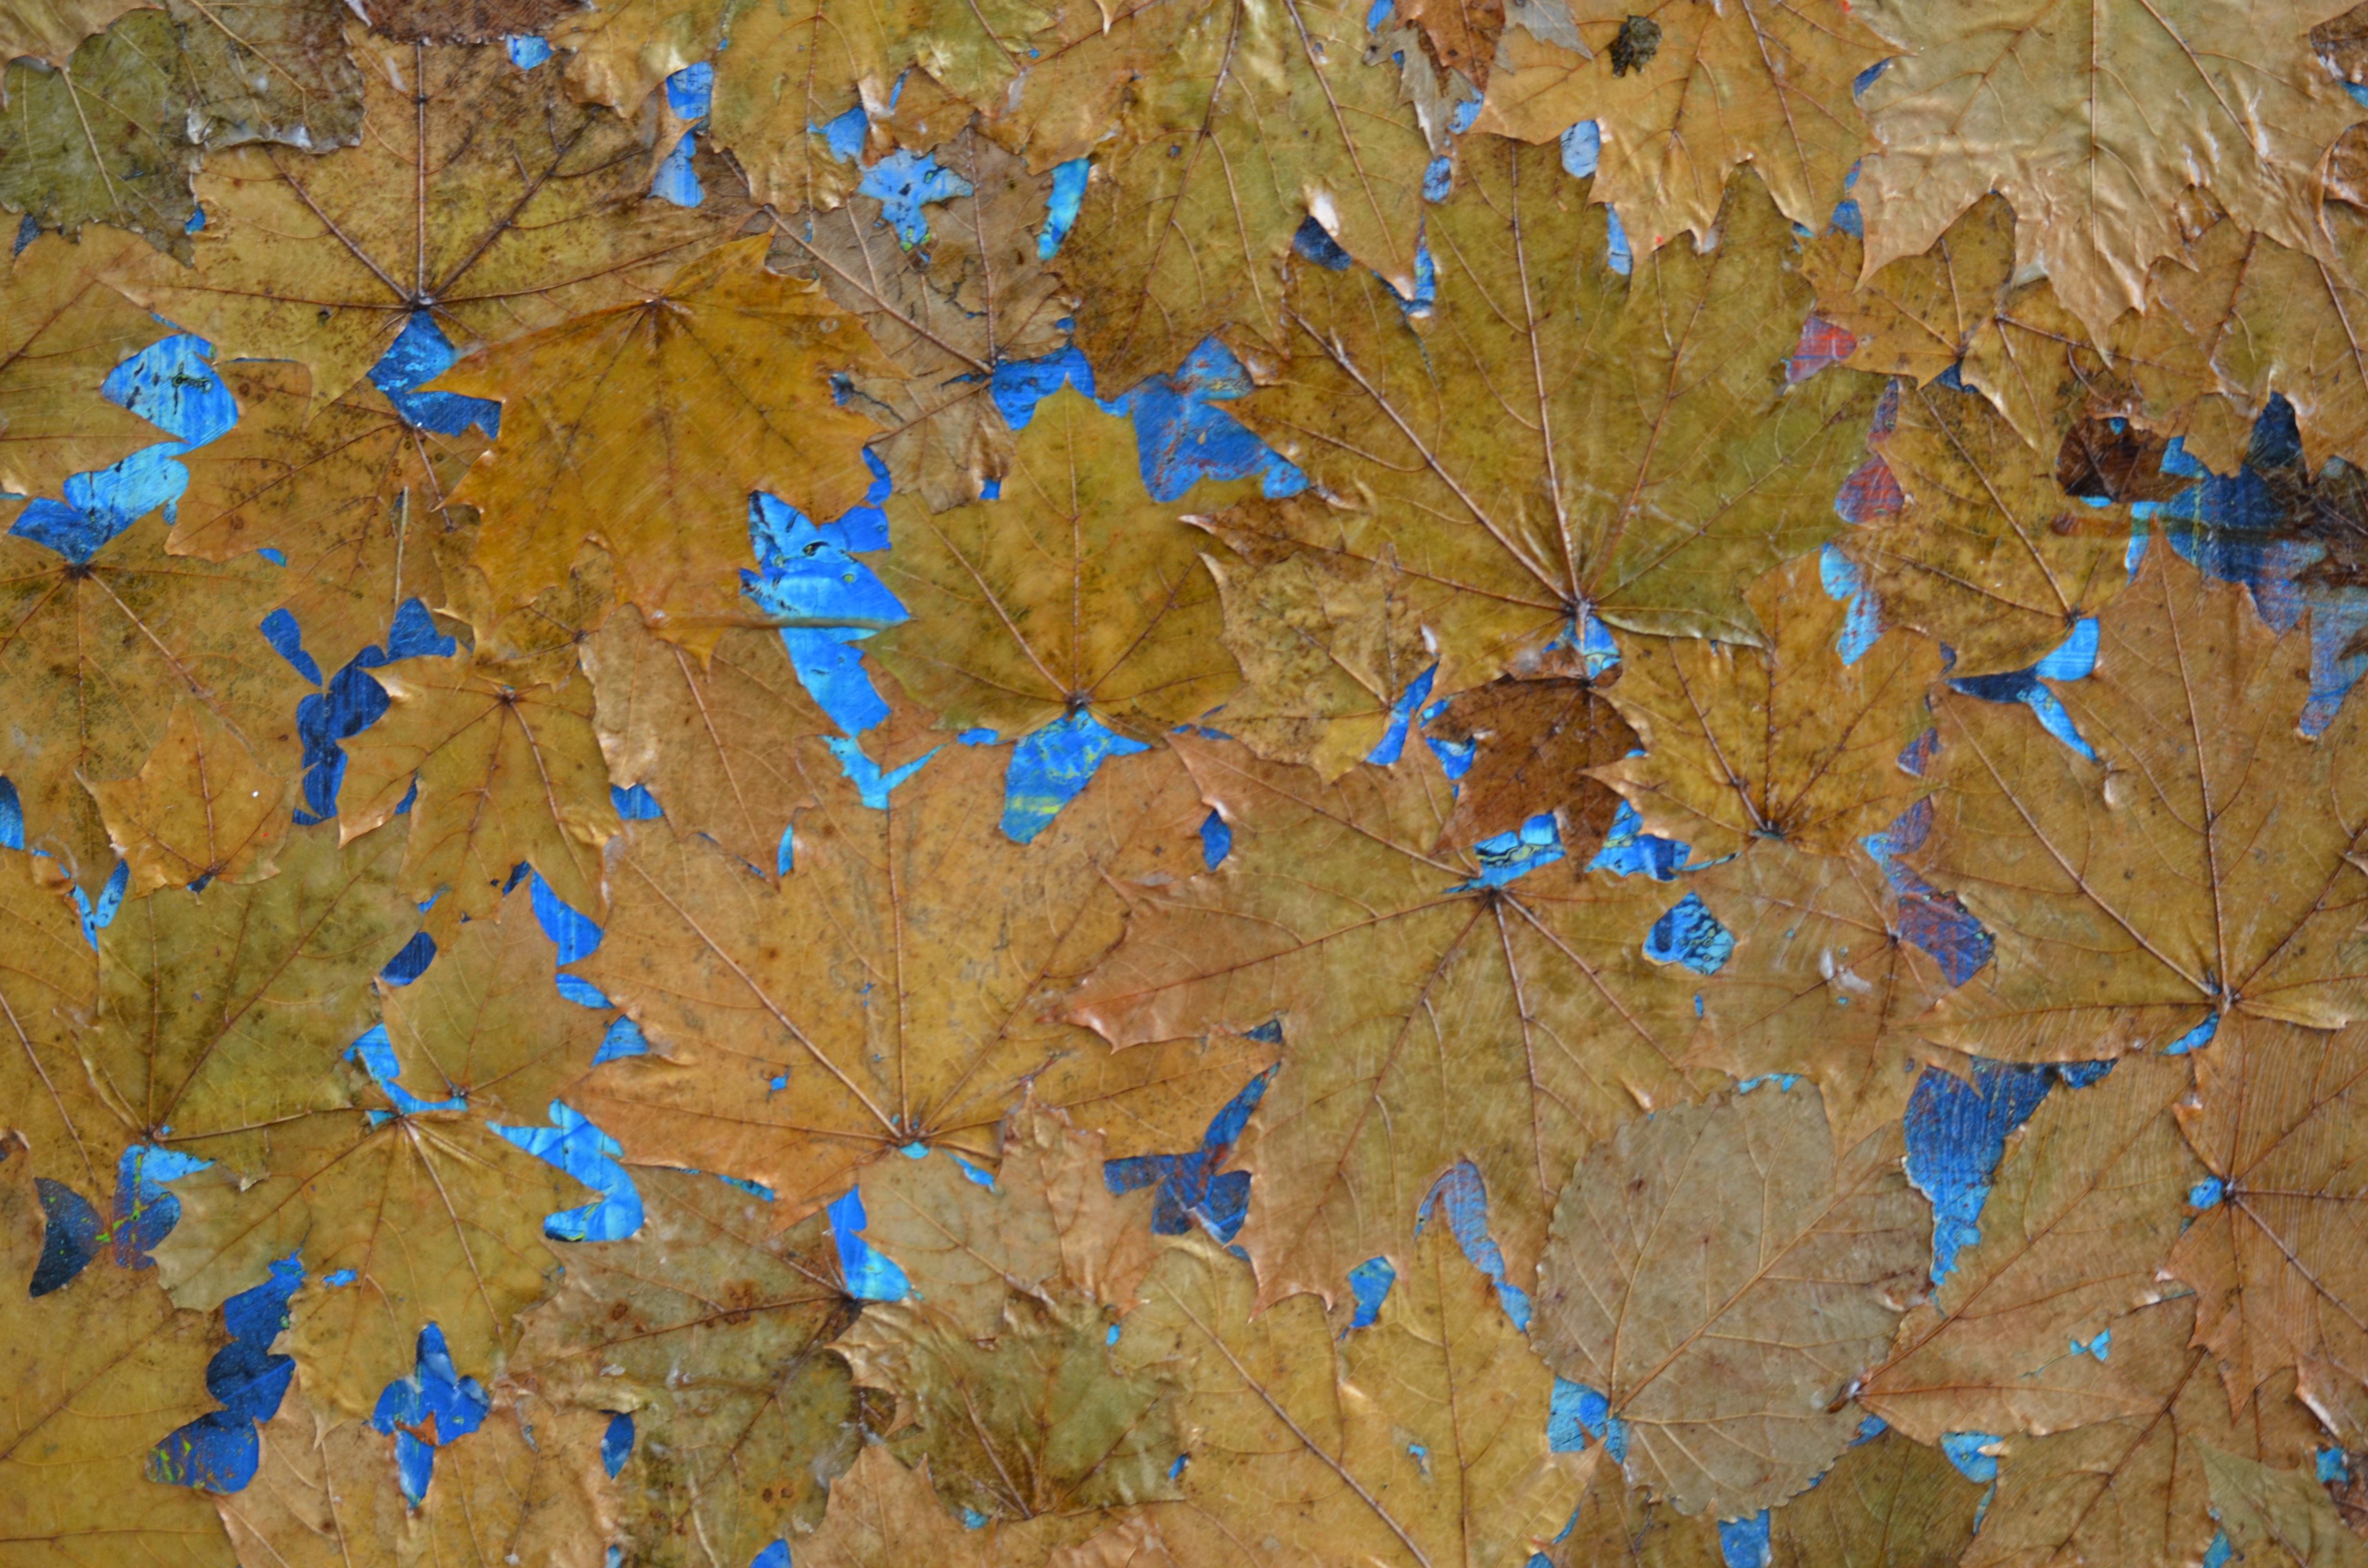 Sky acrylic medium, tempera and leaves on canvas 24 x 30 Inch 2019 Land acrylic medium, tempera and